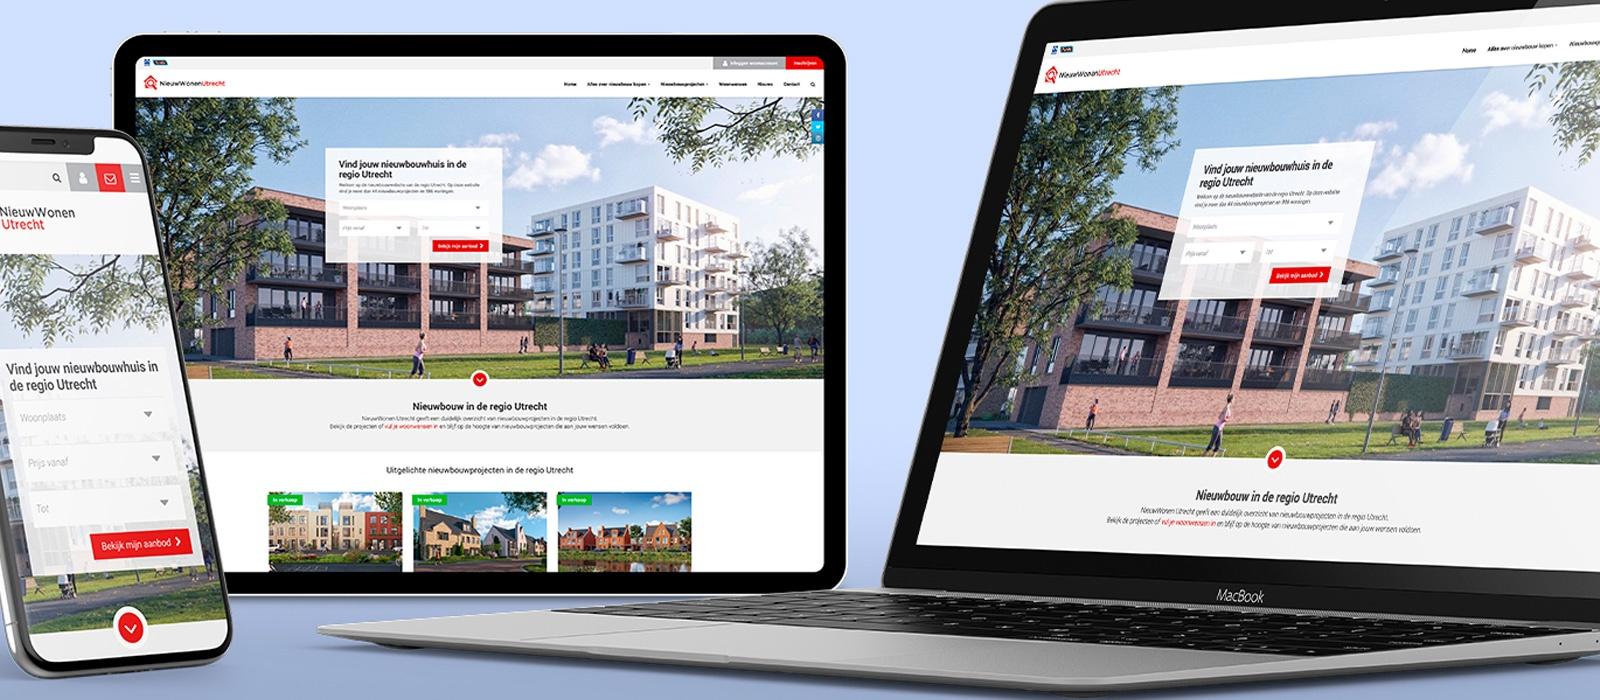 Content management • NieuwWonen Nederland